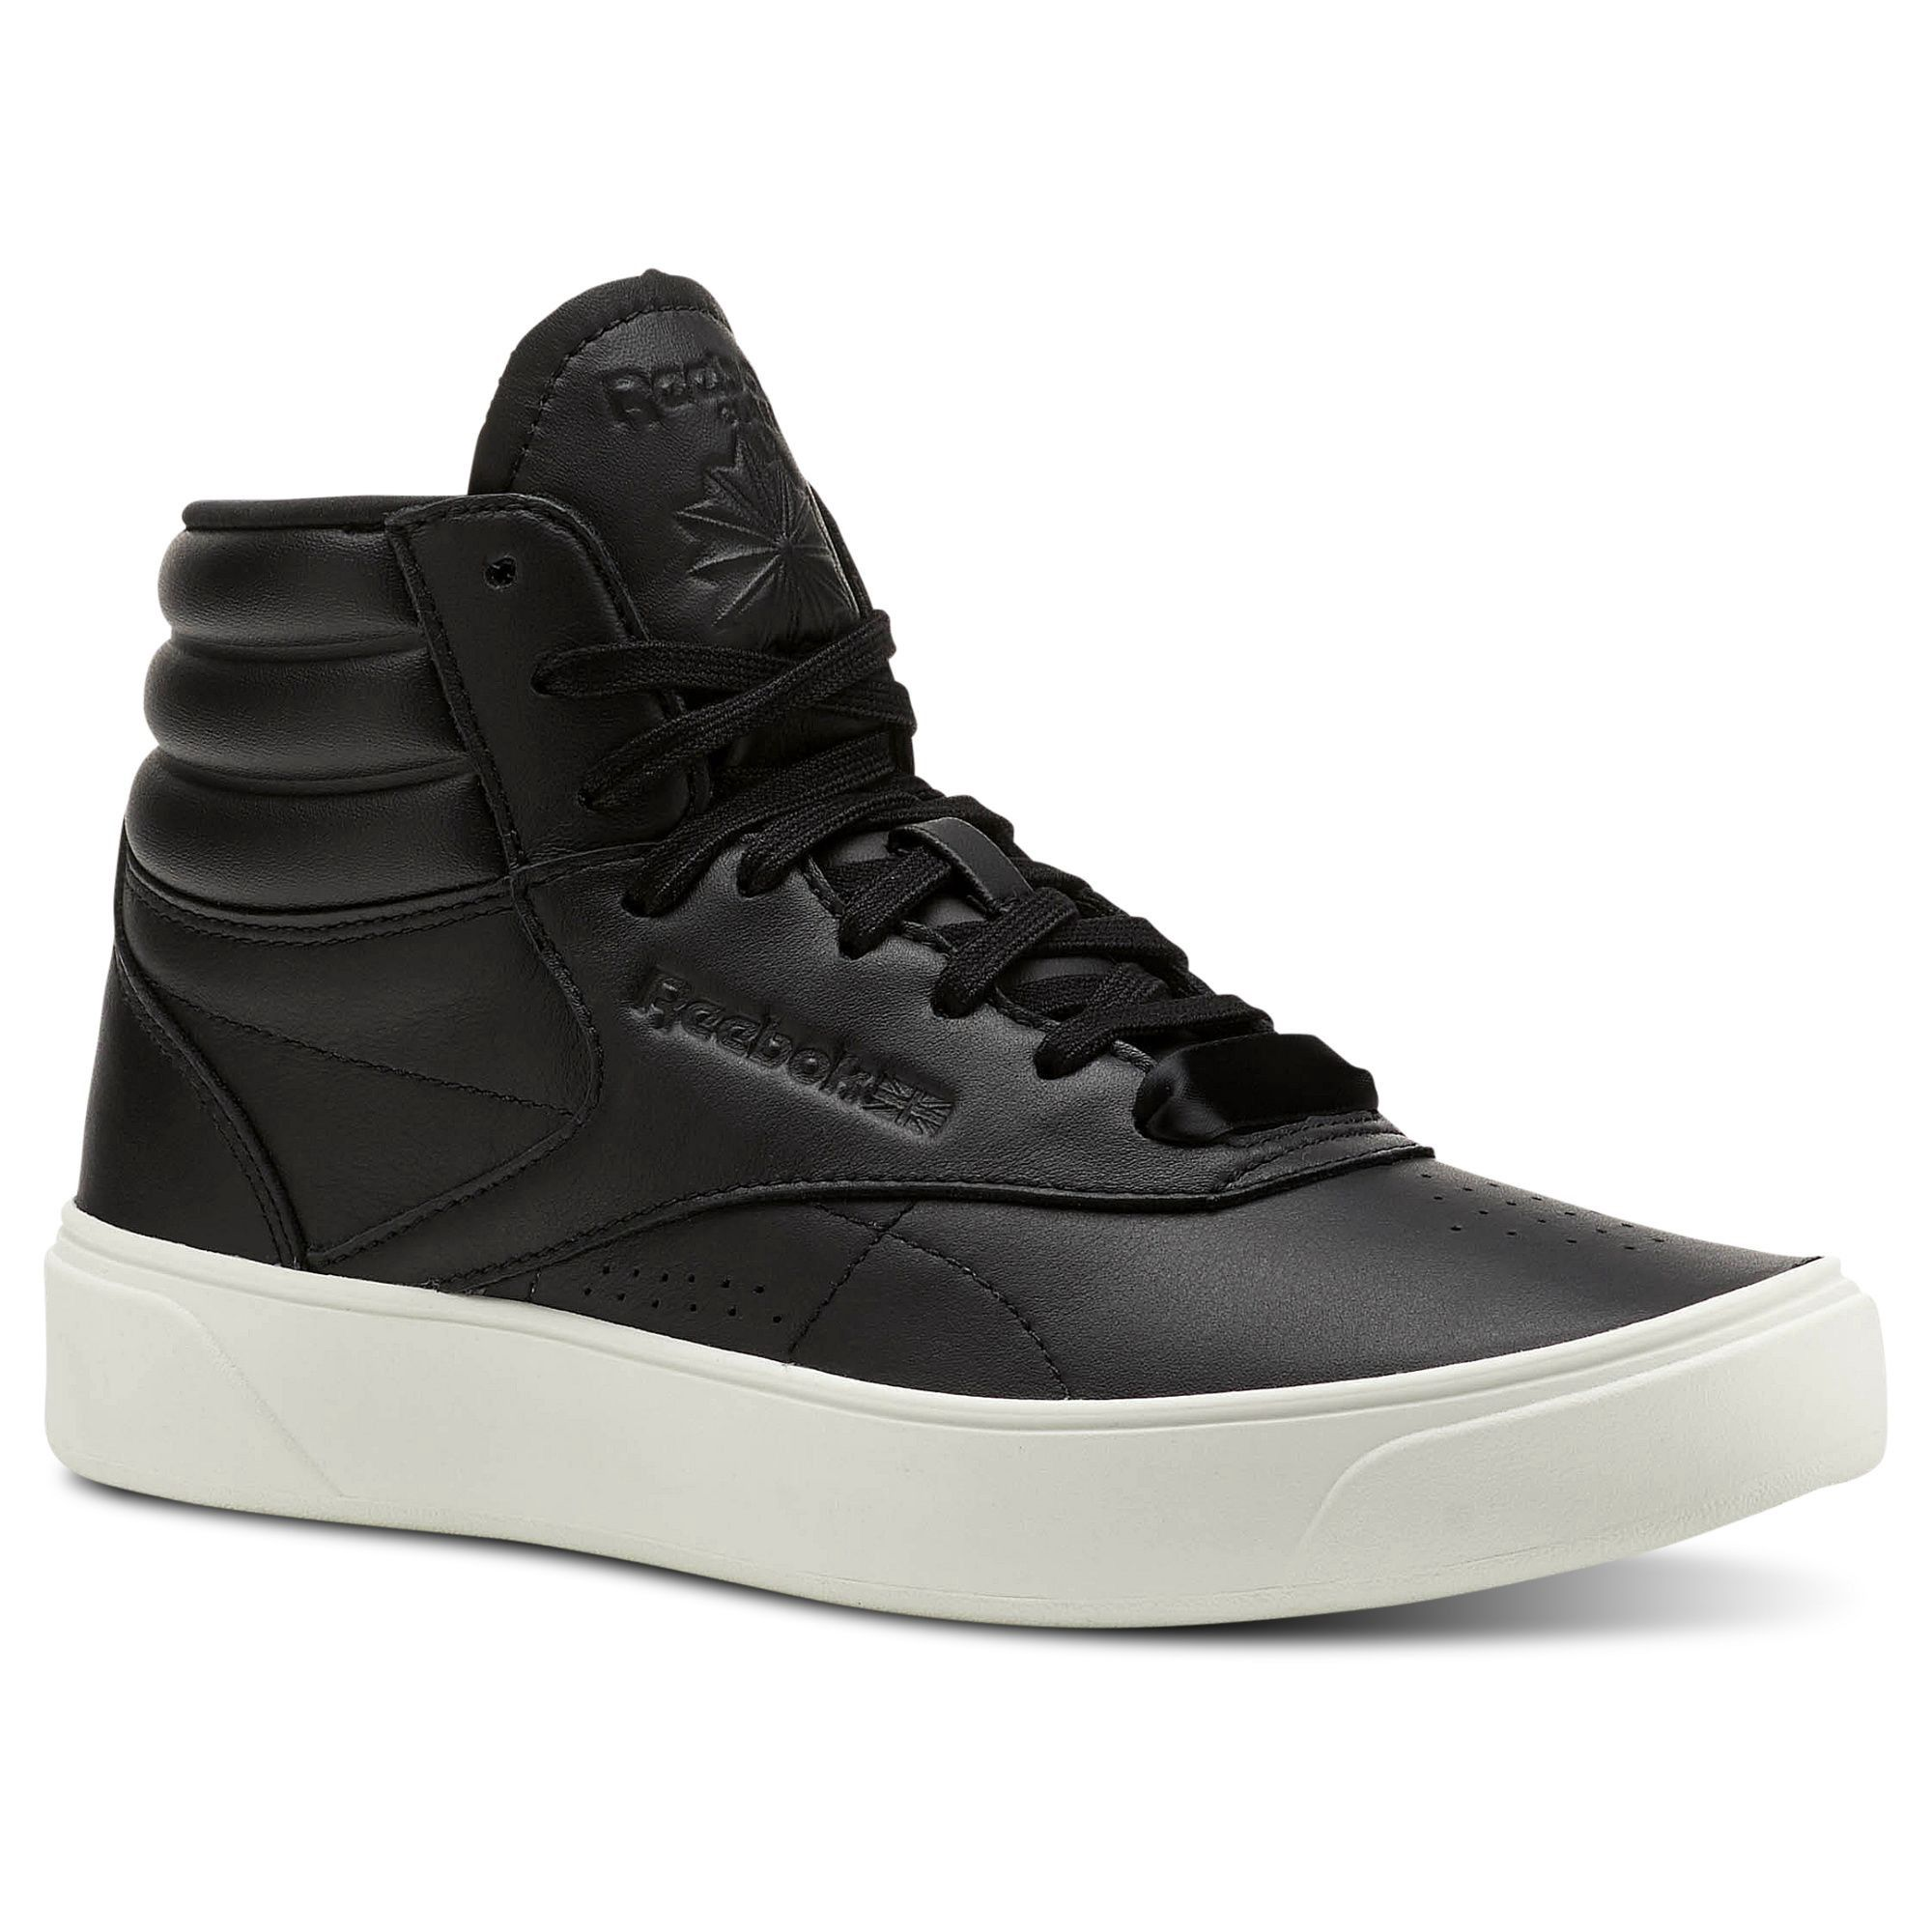 20d22620b206 Reebok Freestyle Hi Birthday - Grade School Kids Fitness Shoes in Silver  Metallic   Gold Metallic   Black